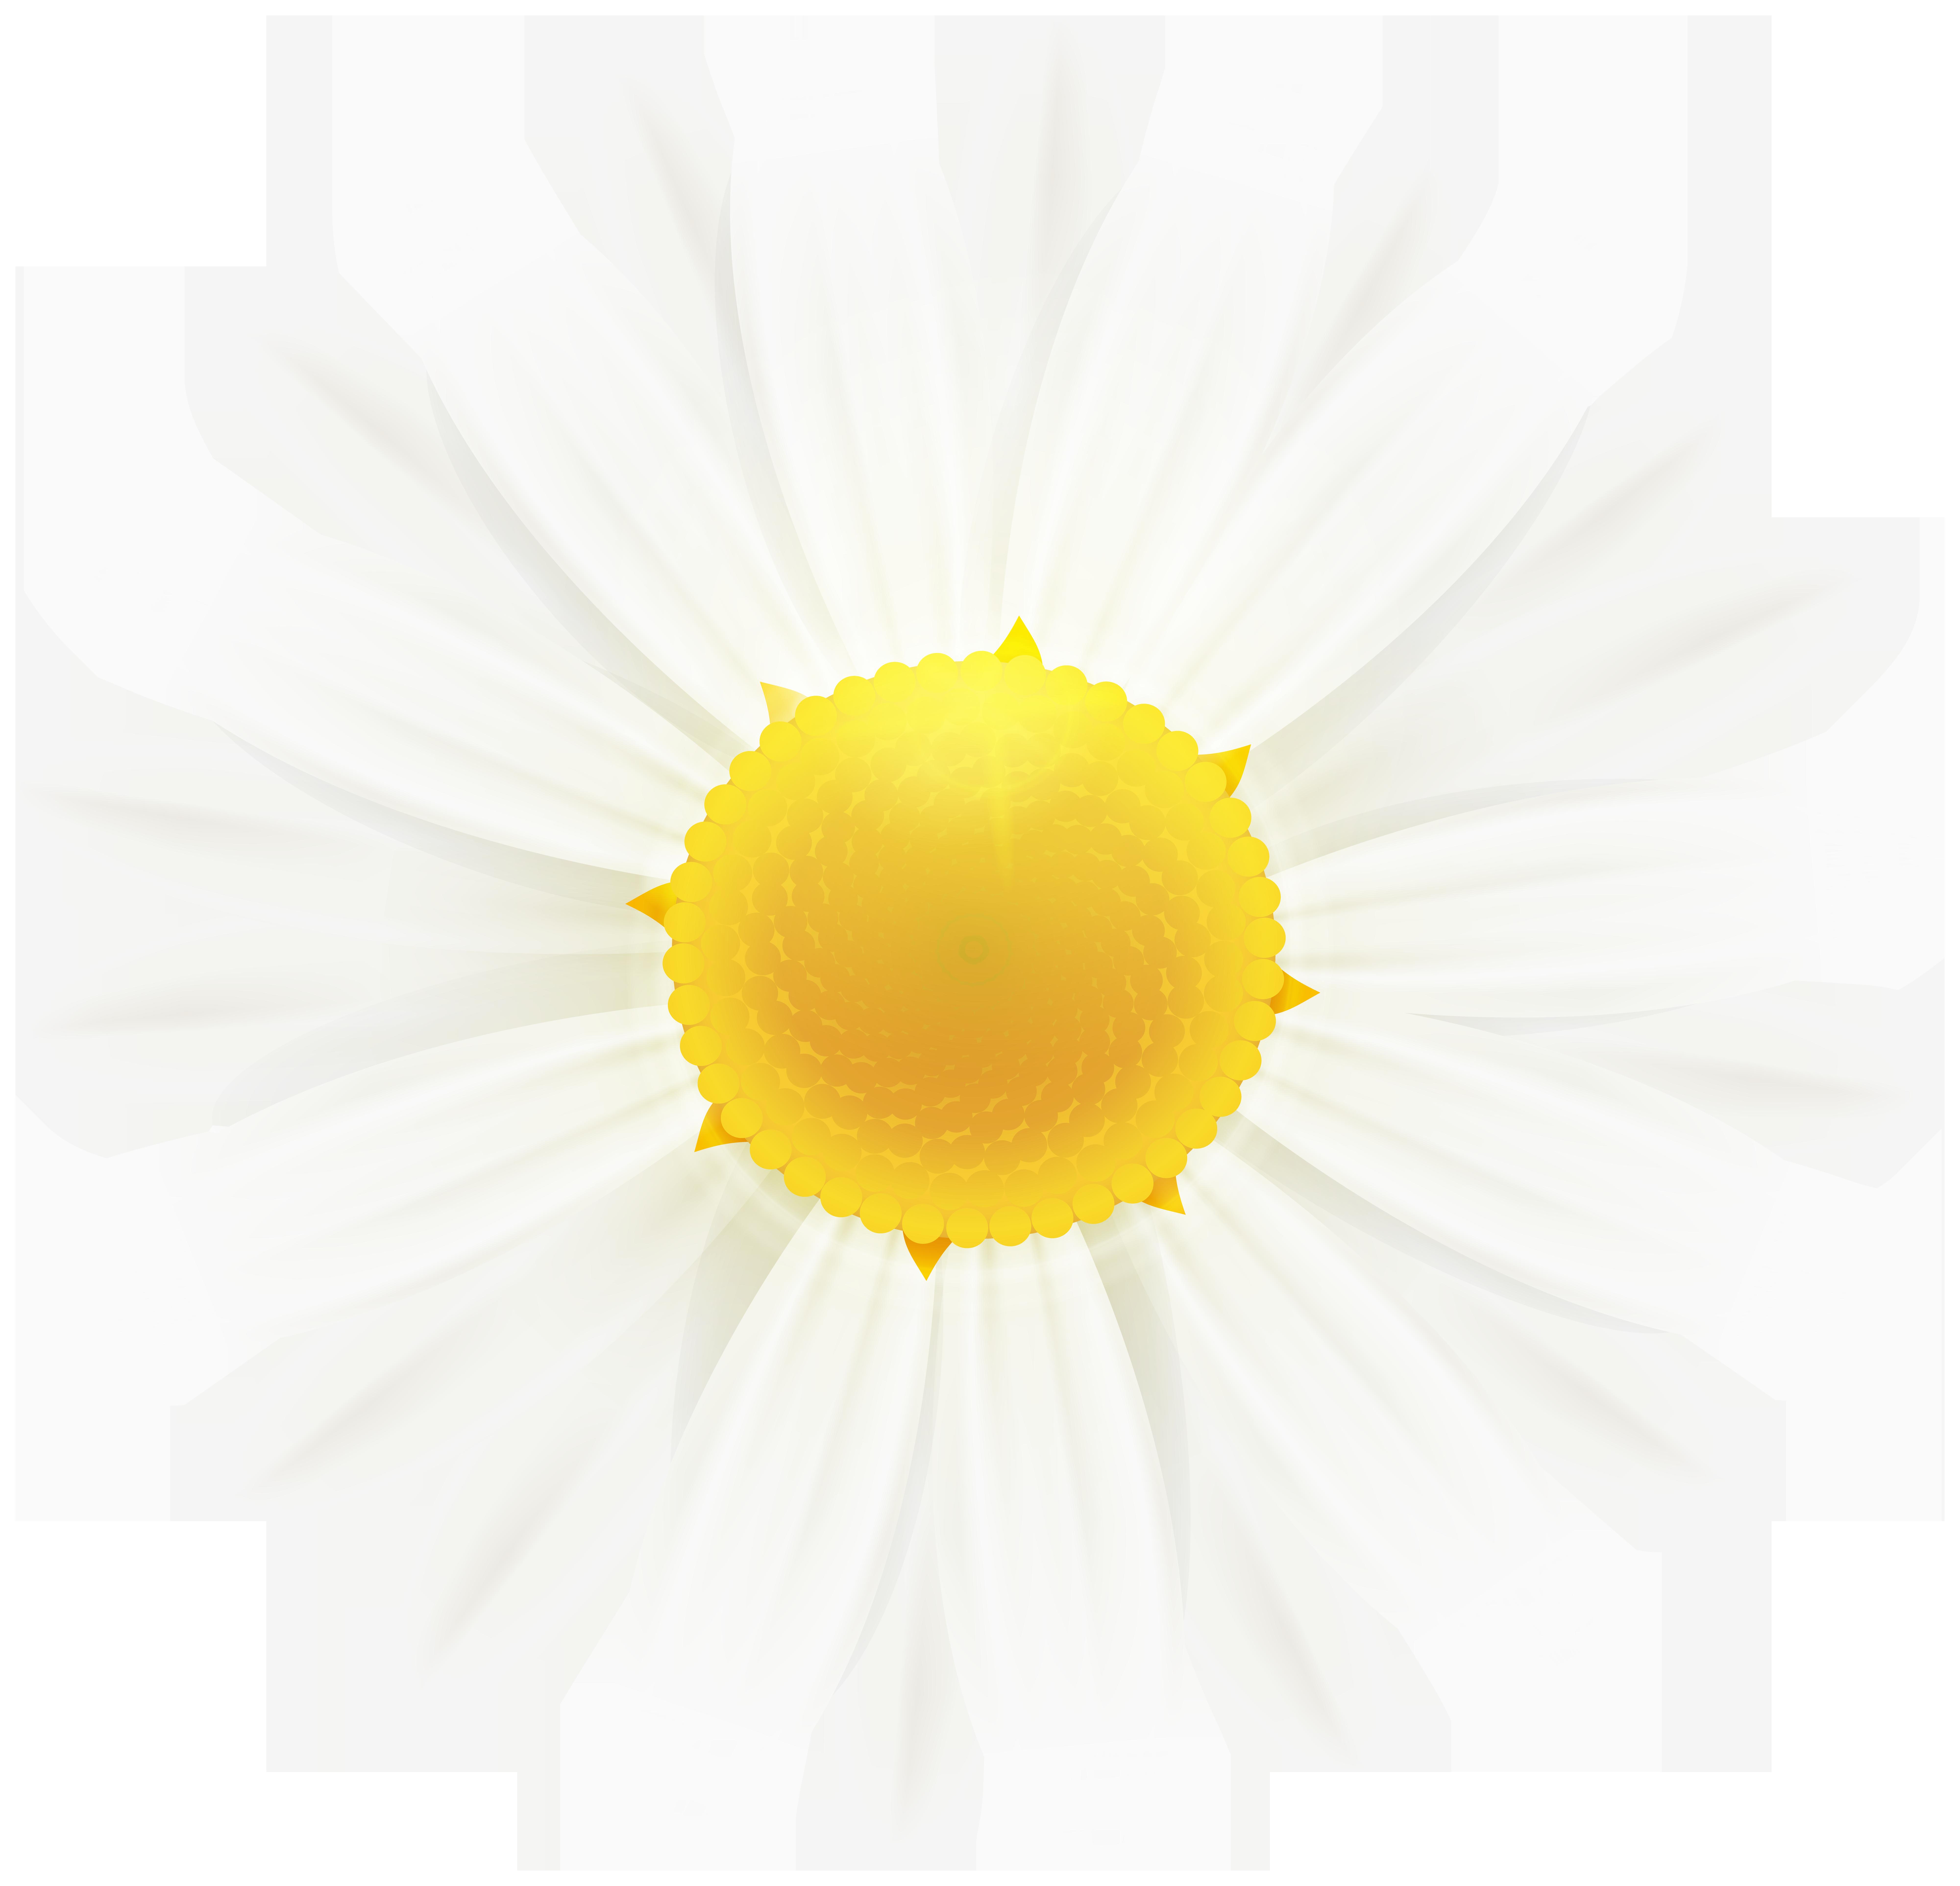 White Daisy Flower Clipart Image.